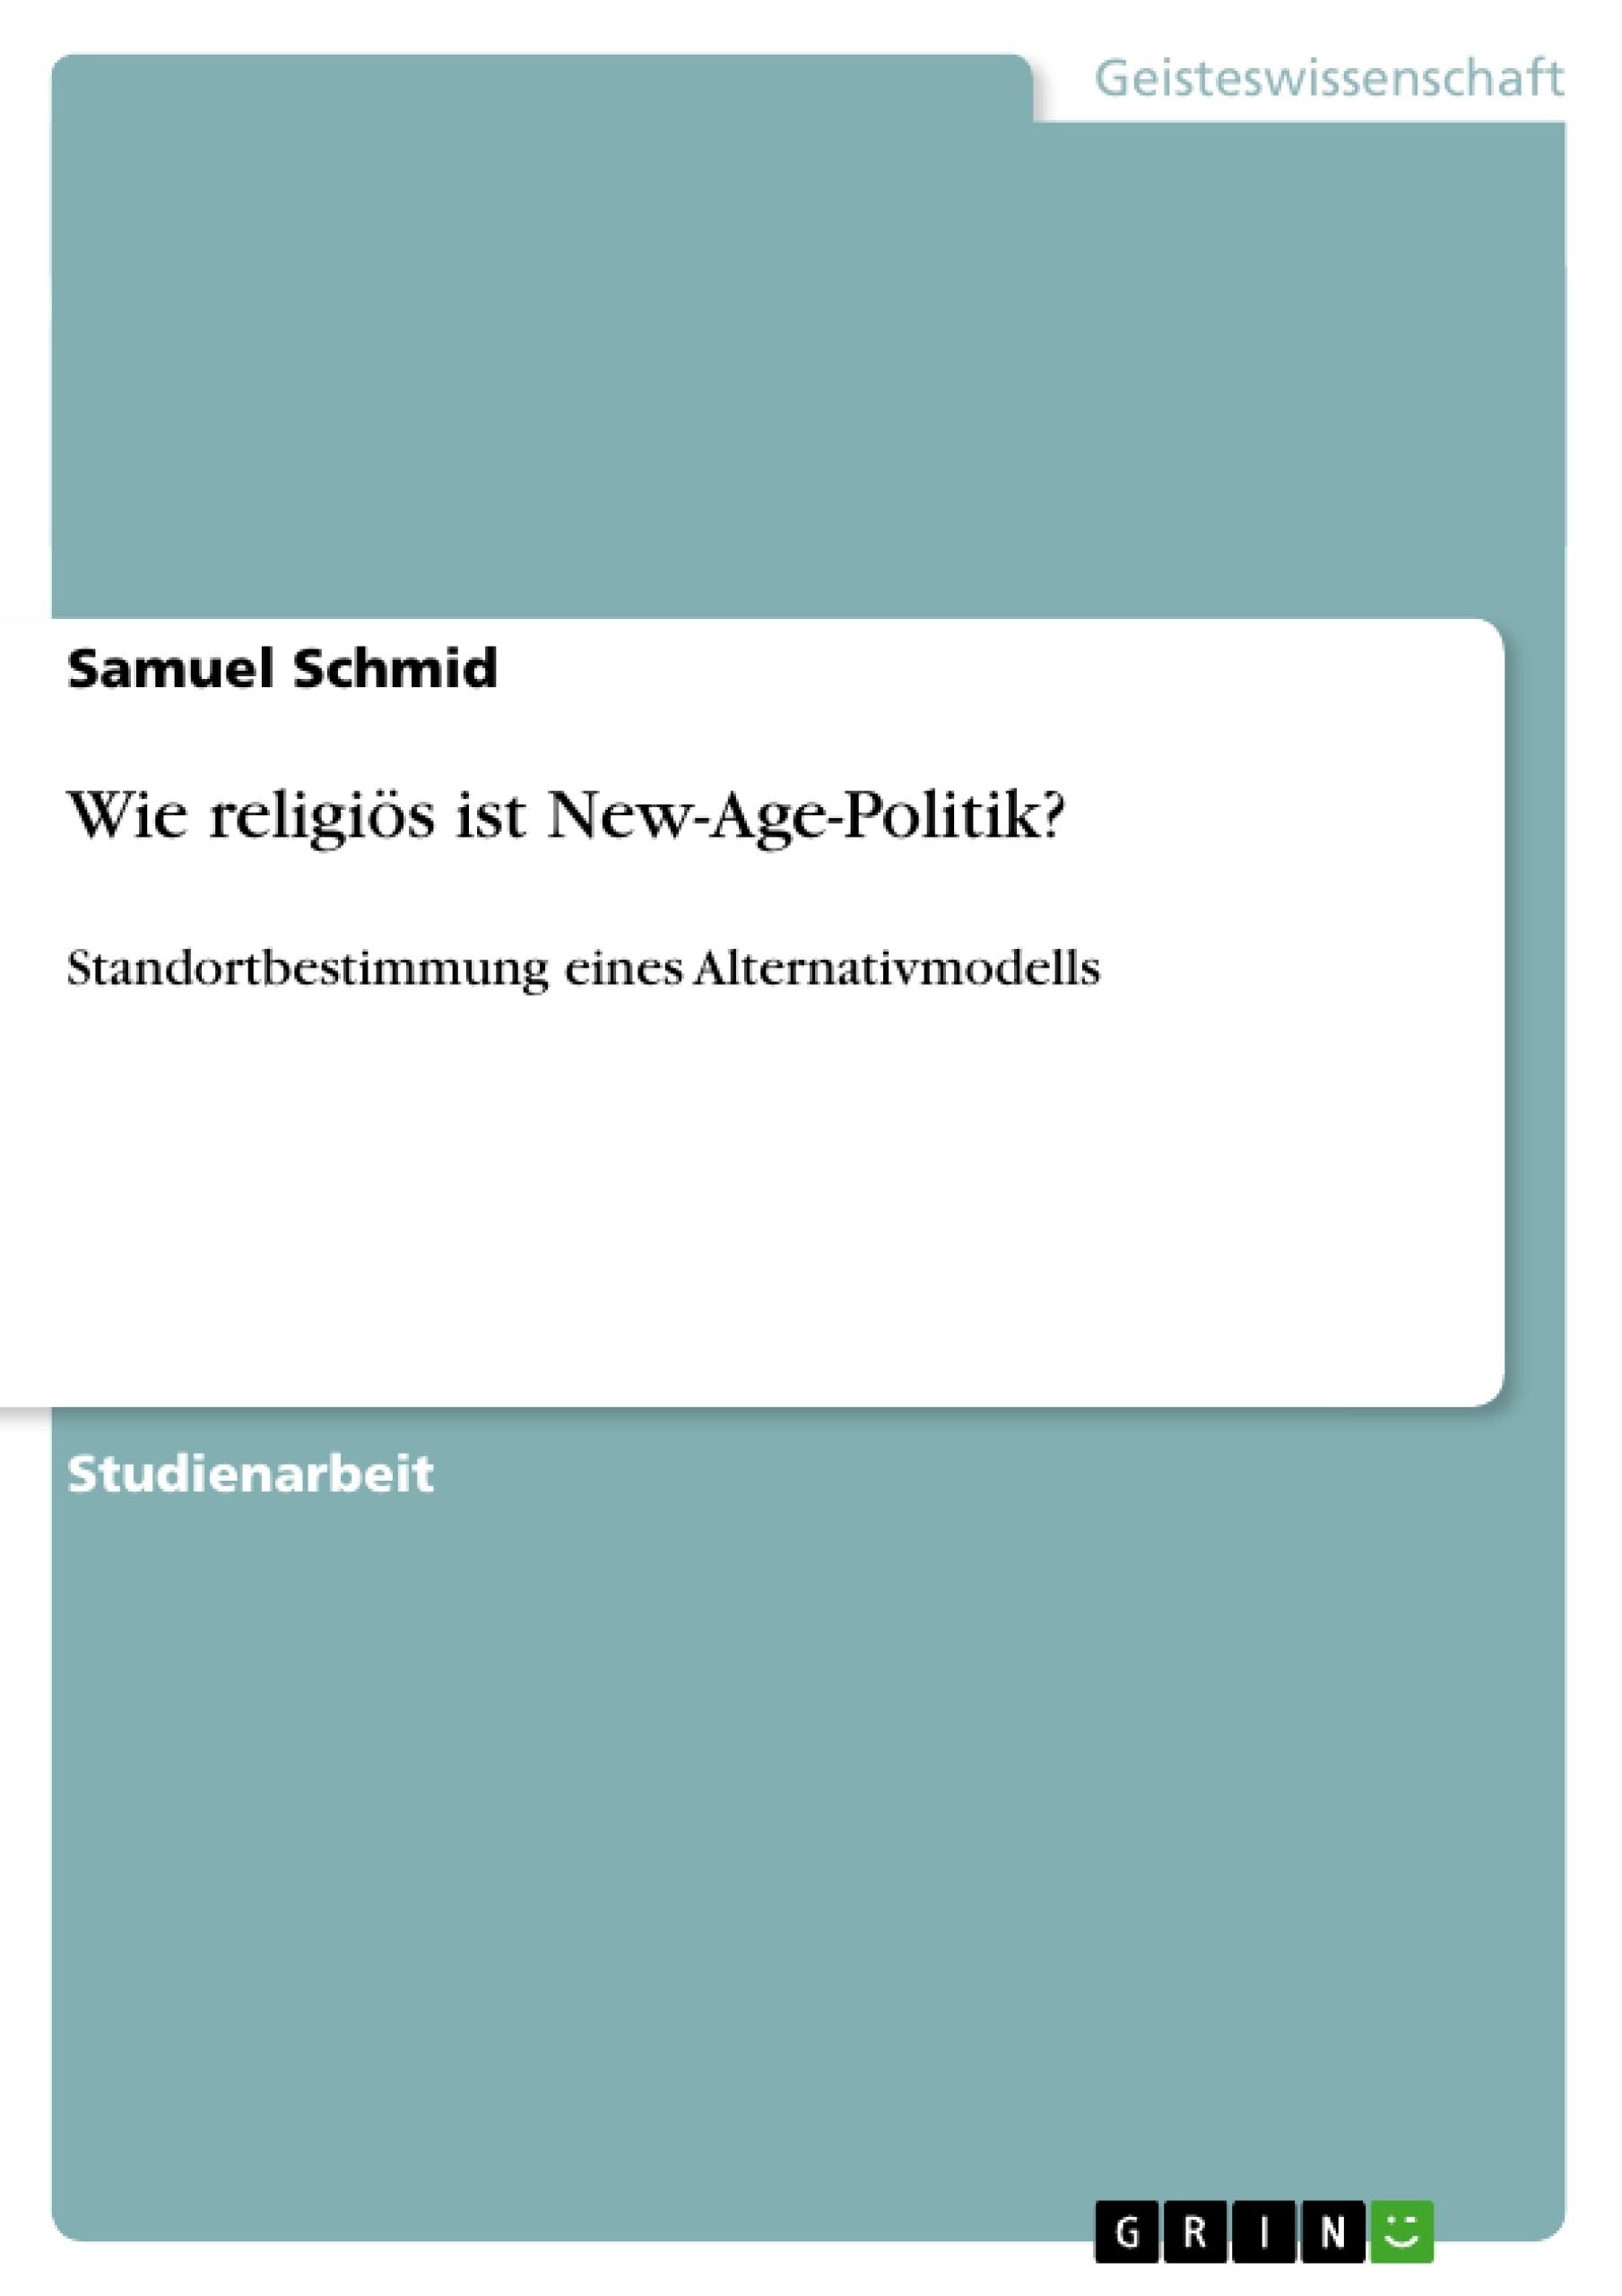 Titel: Wie religiös ist New-Age-Politik?